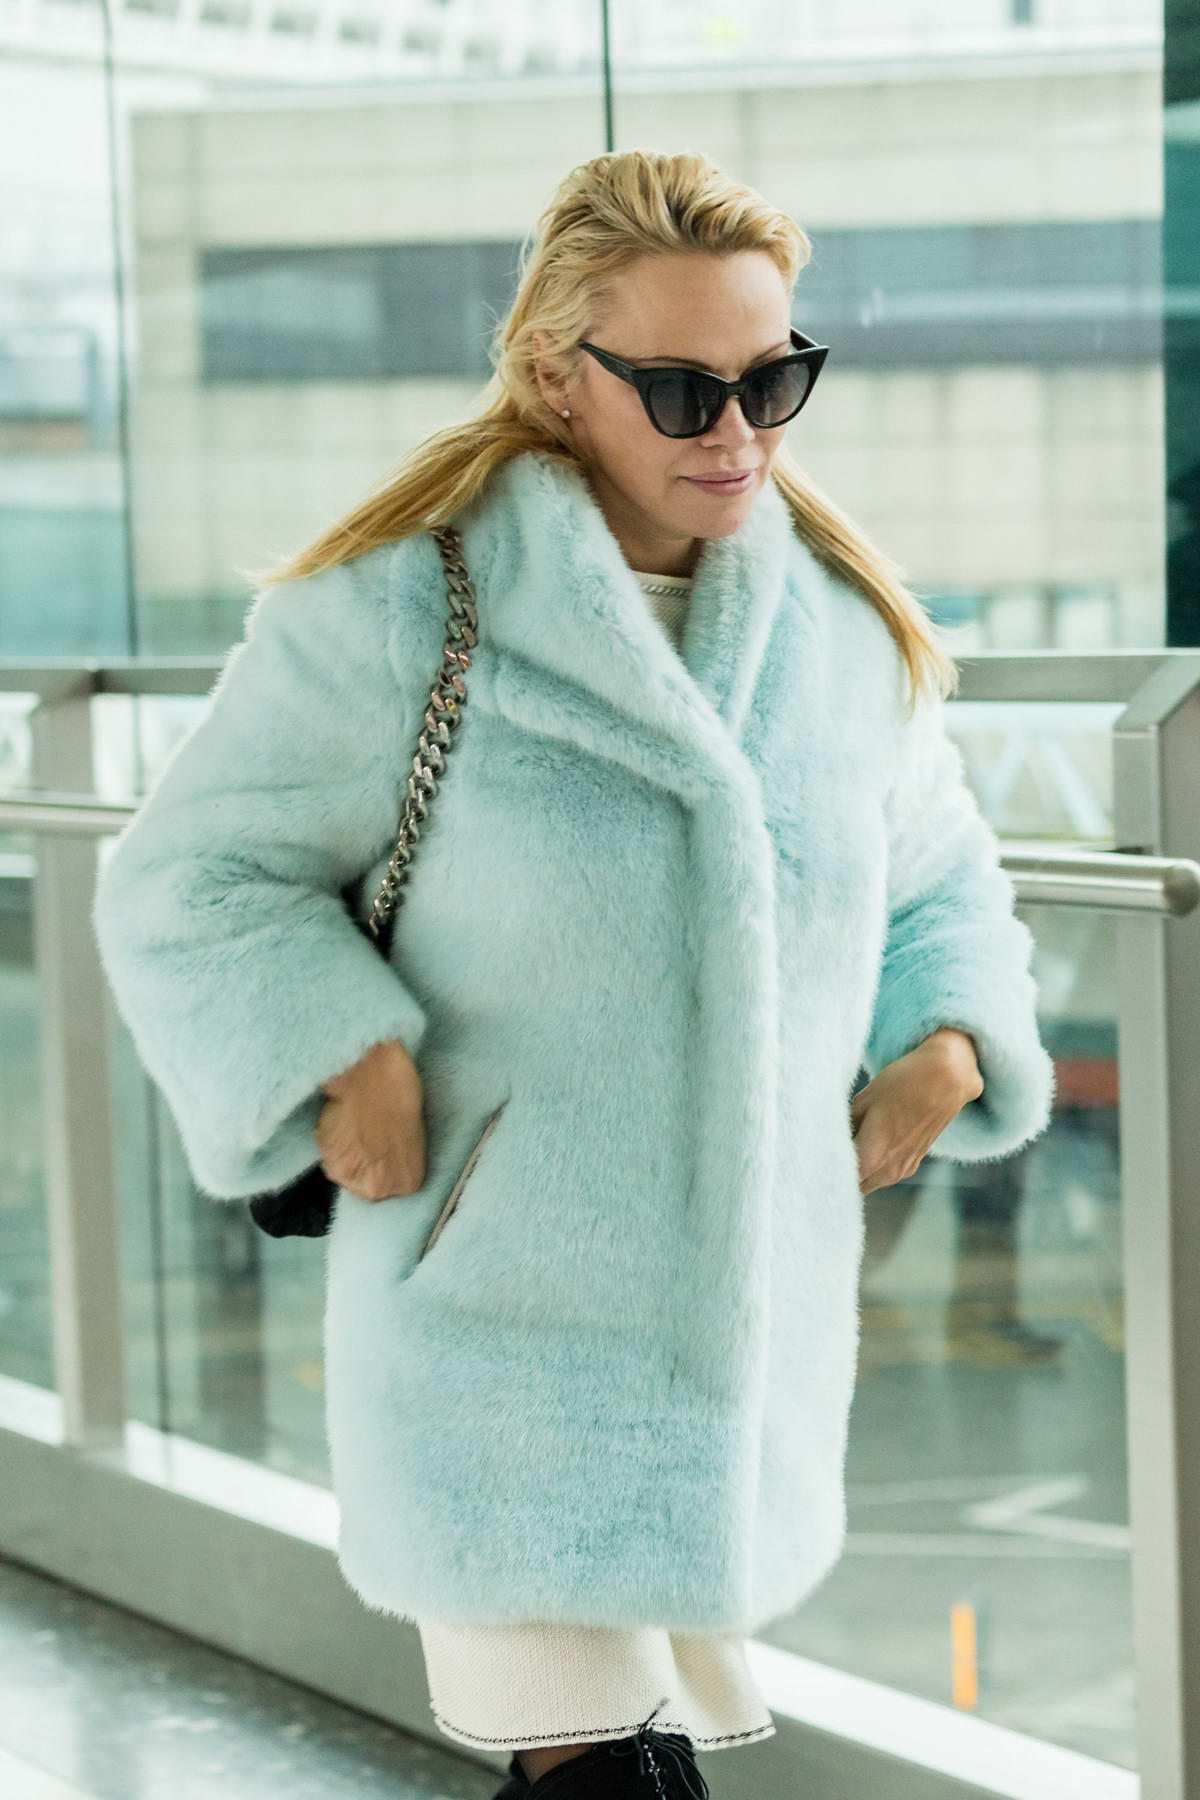 Pamela Anderson looked very tired as leaves Heathrow airport in London